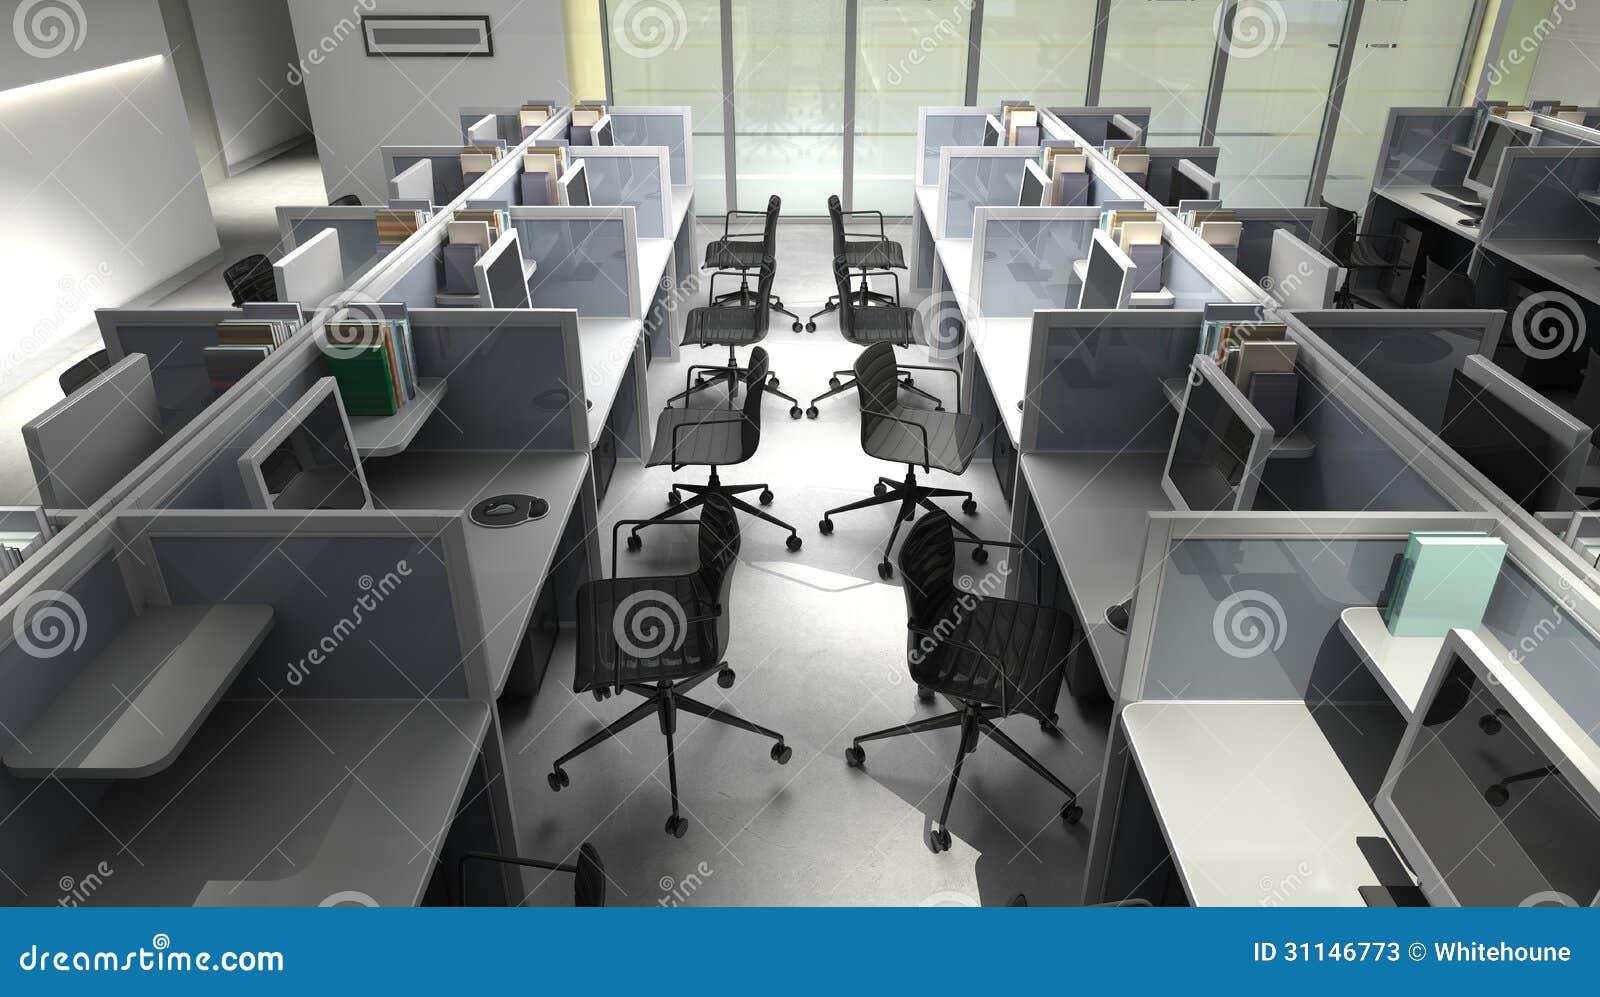 HD wallpapers laboratory interior design